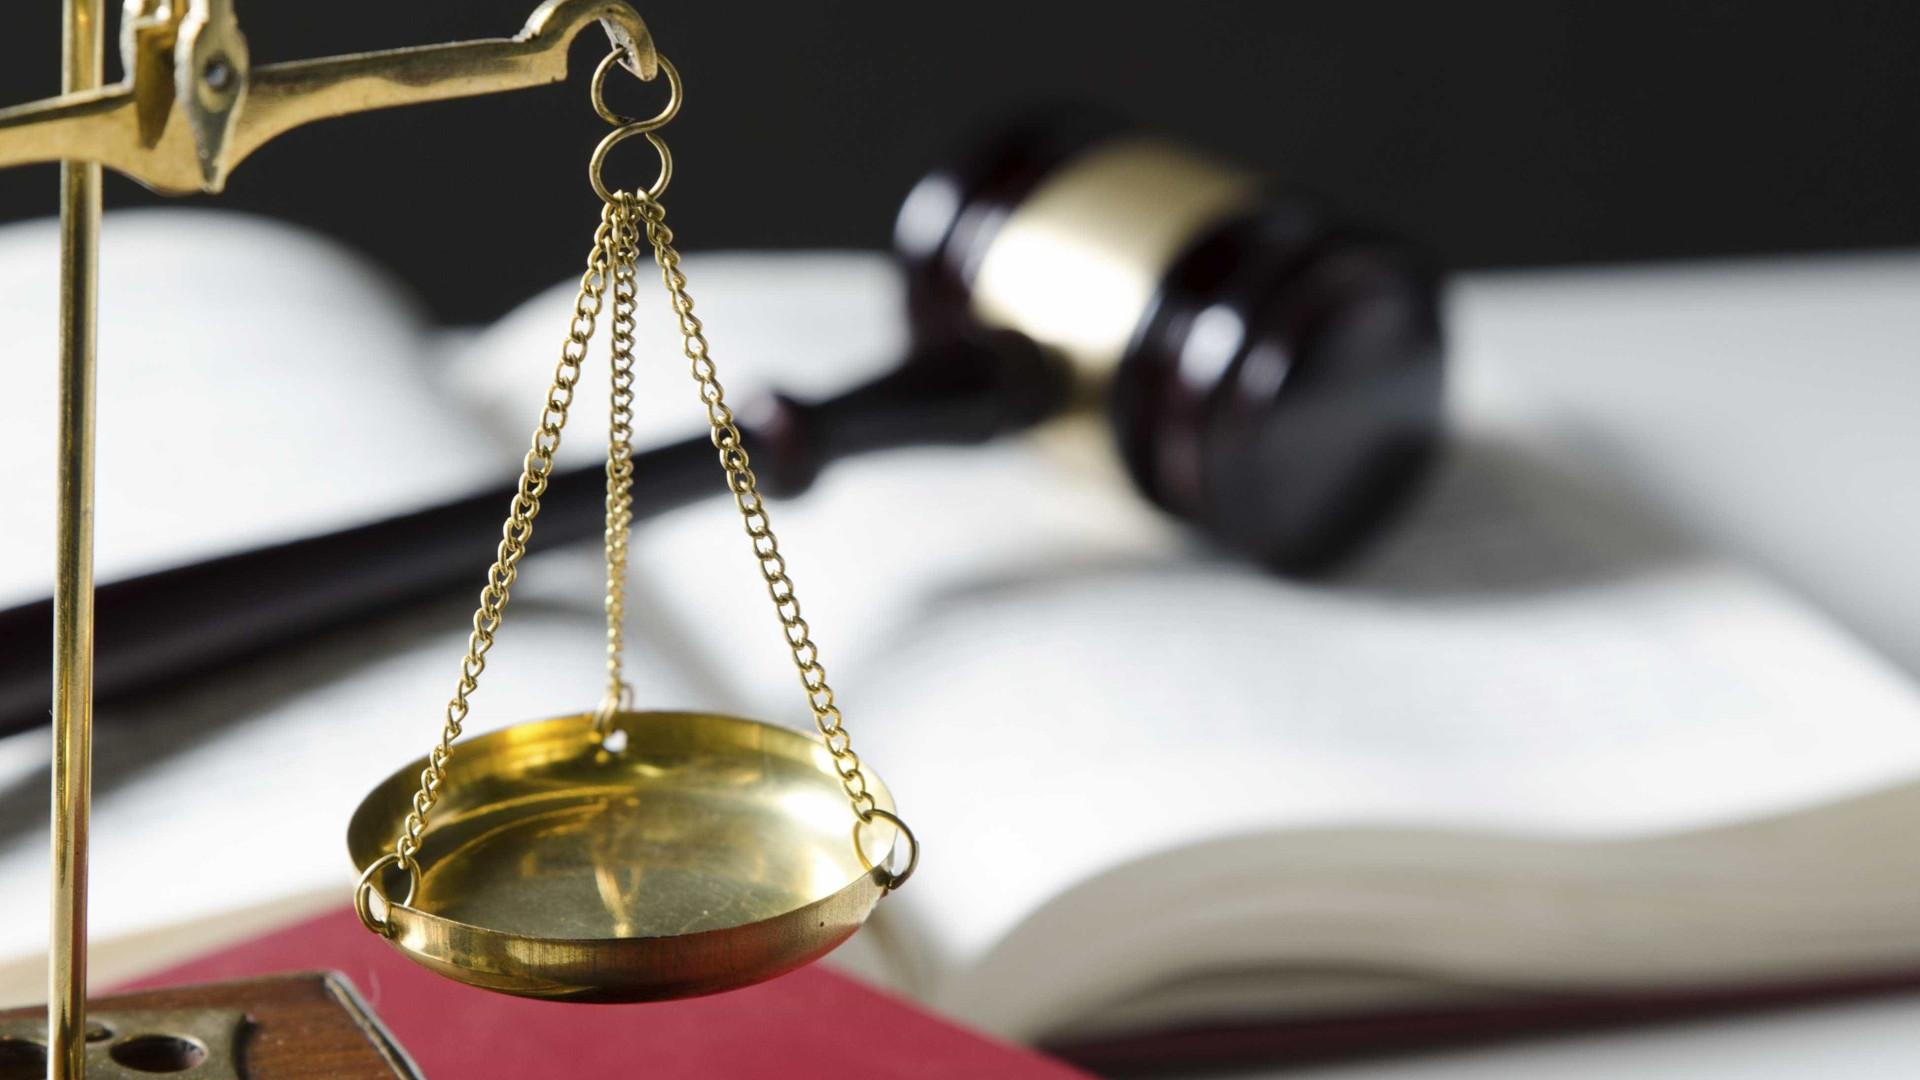 Juízes marcam greve para os dias 3 e 4 de outubro